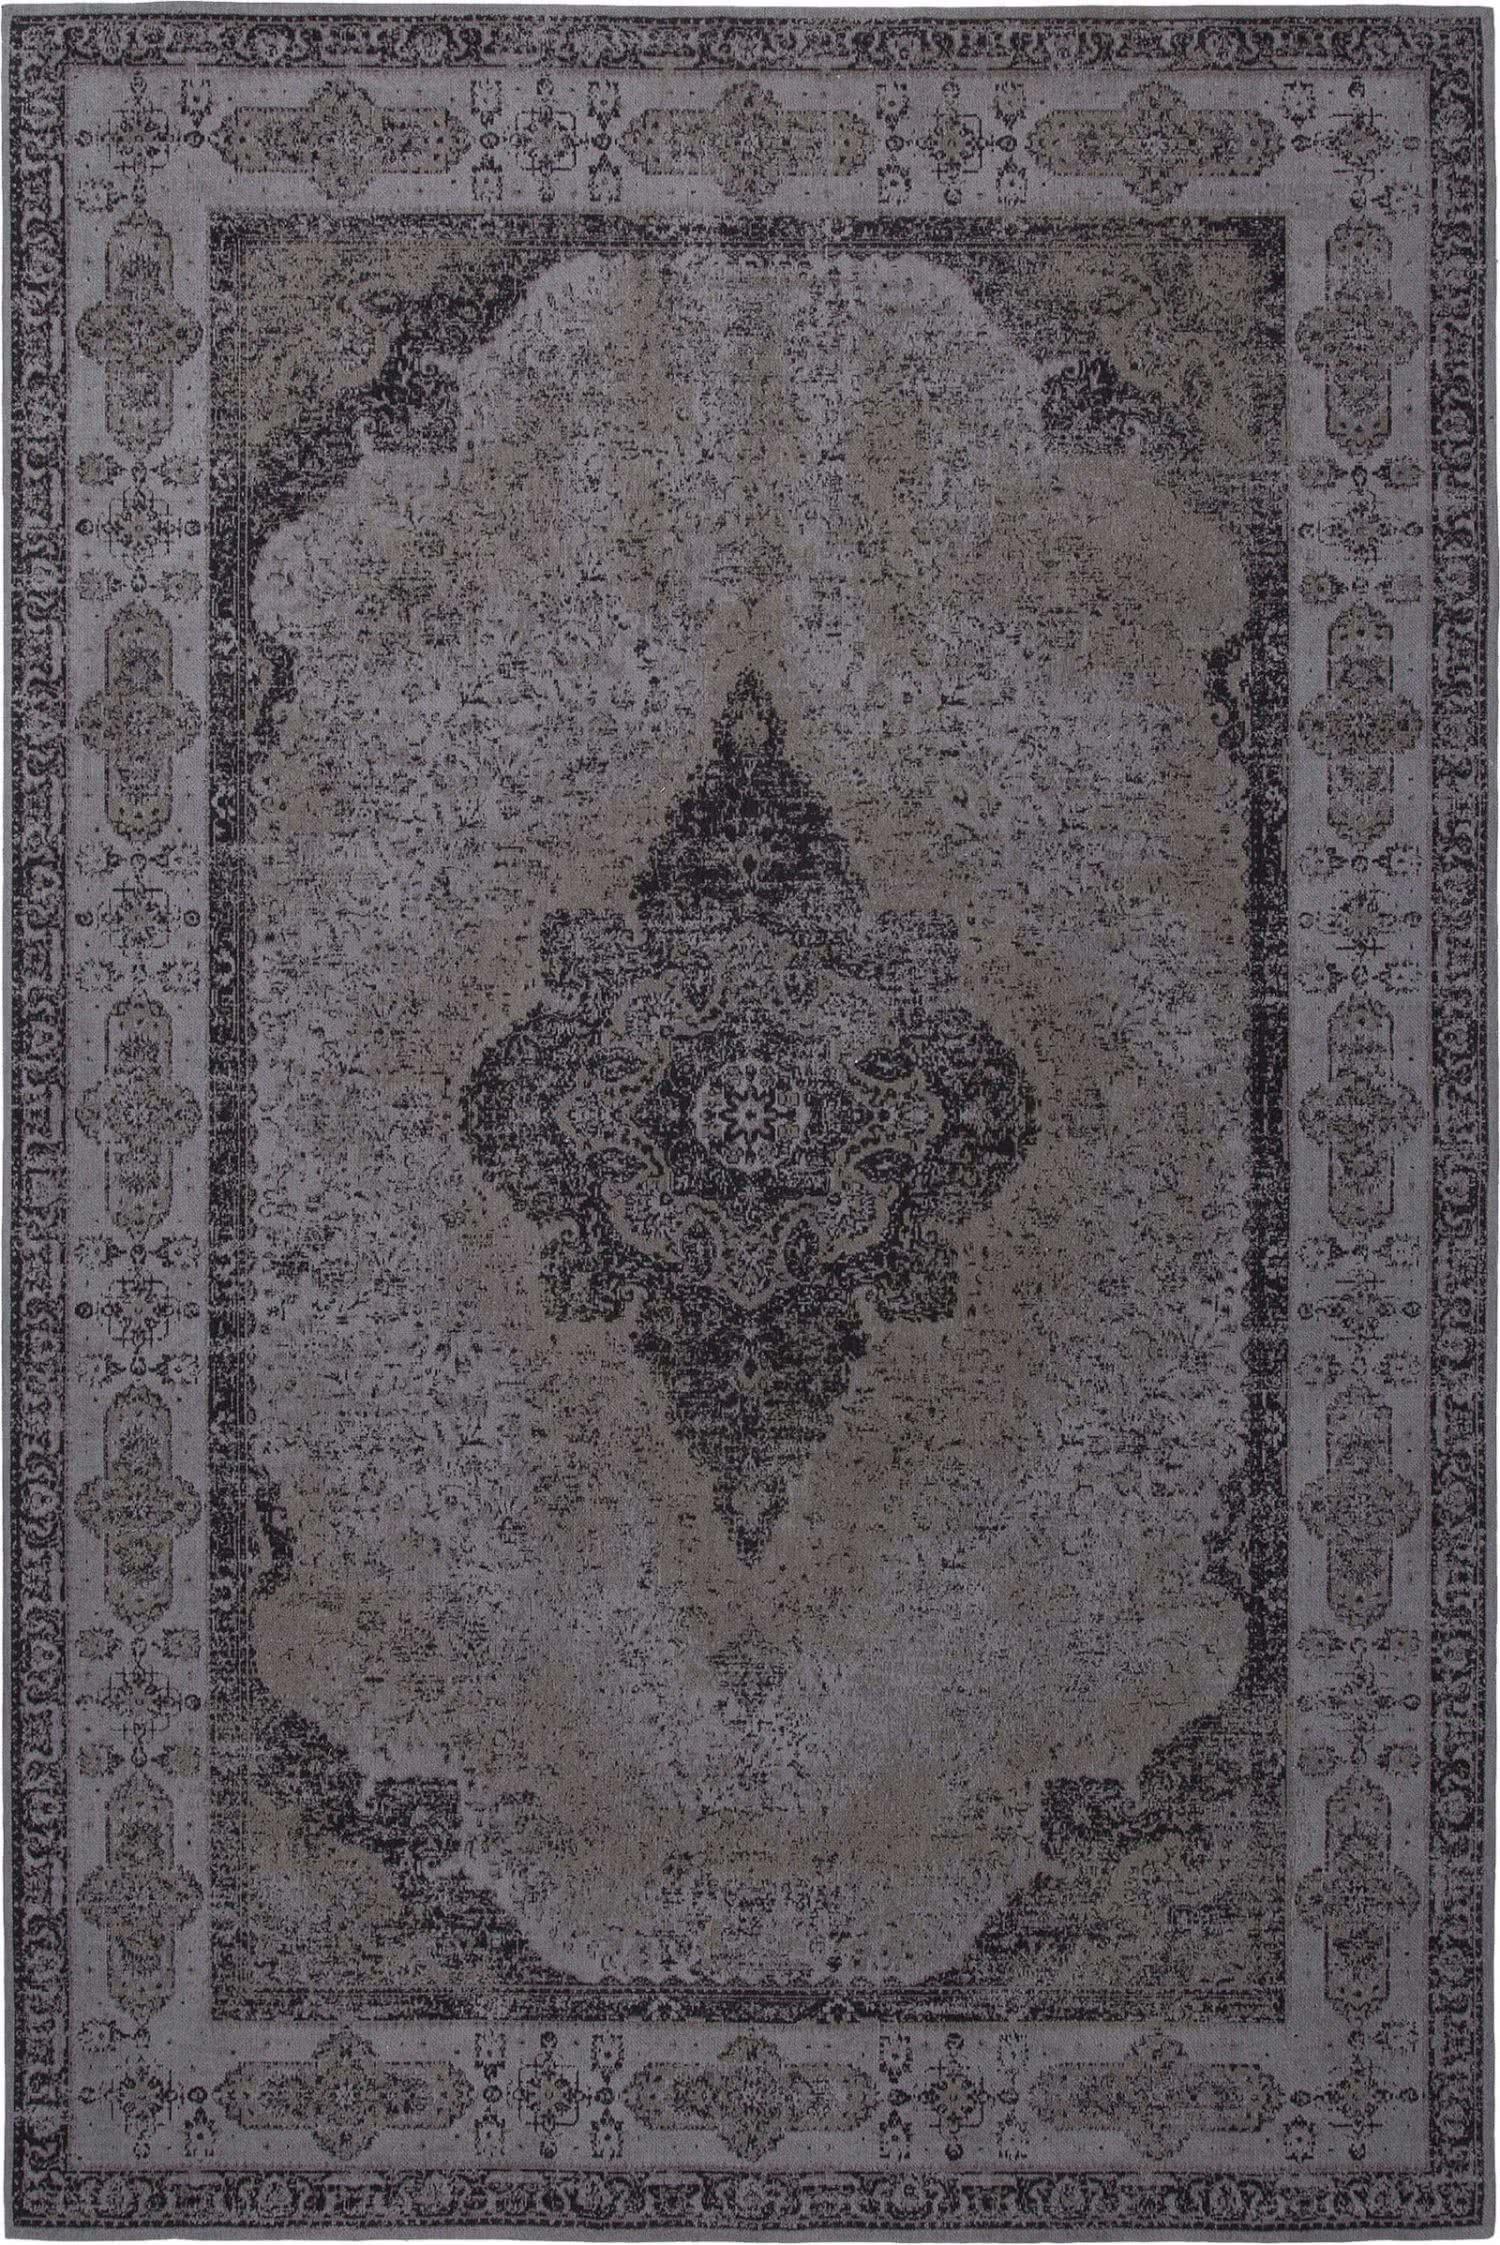 Vintage Teppich Retro Grau Schwarz Flachgewebt